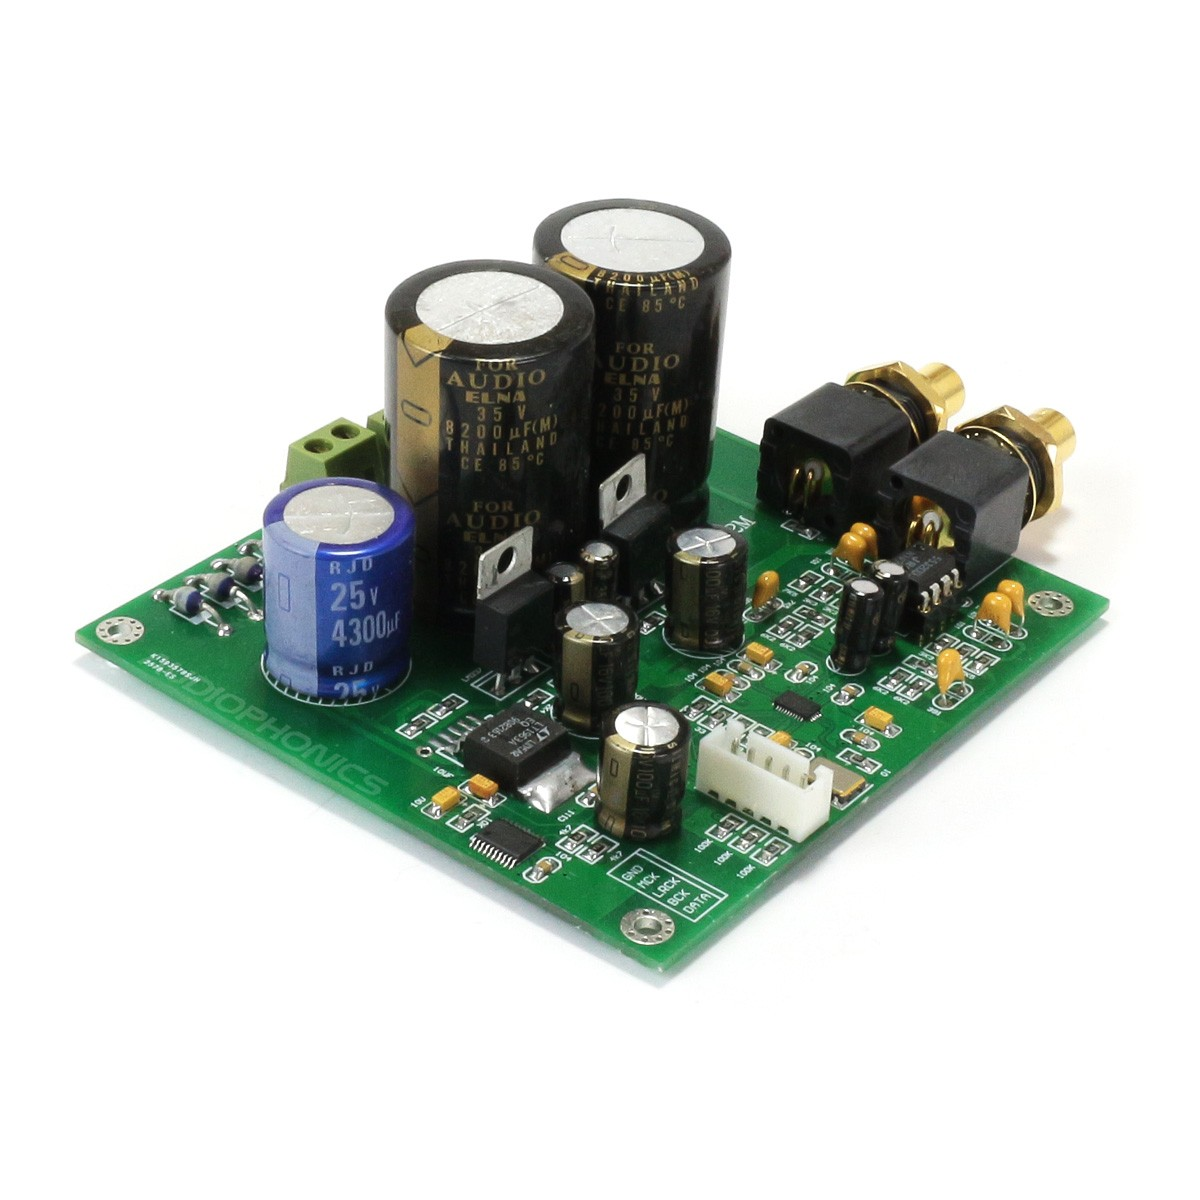 ESS ES9038Q2M DAC Module I2S 32bit 192khz DSD LT1963 Regulator NJM5532 AOP